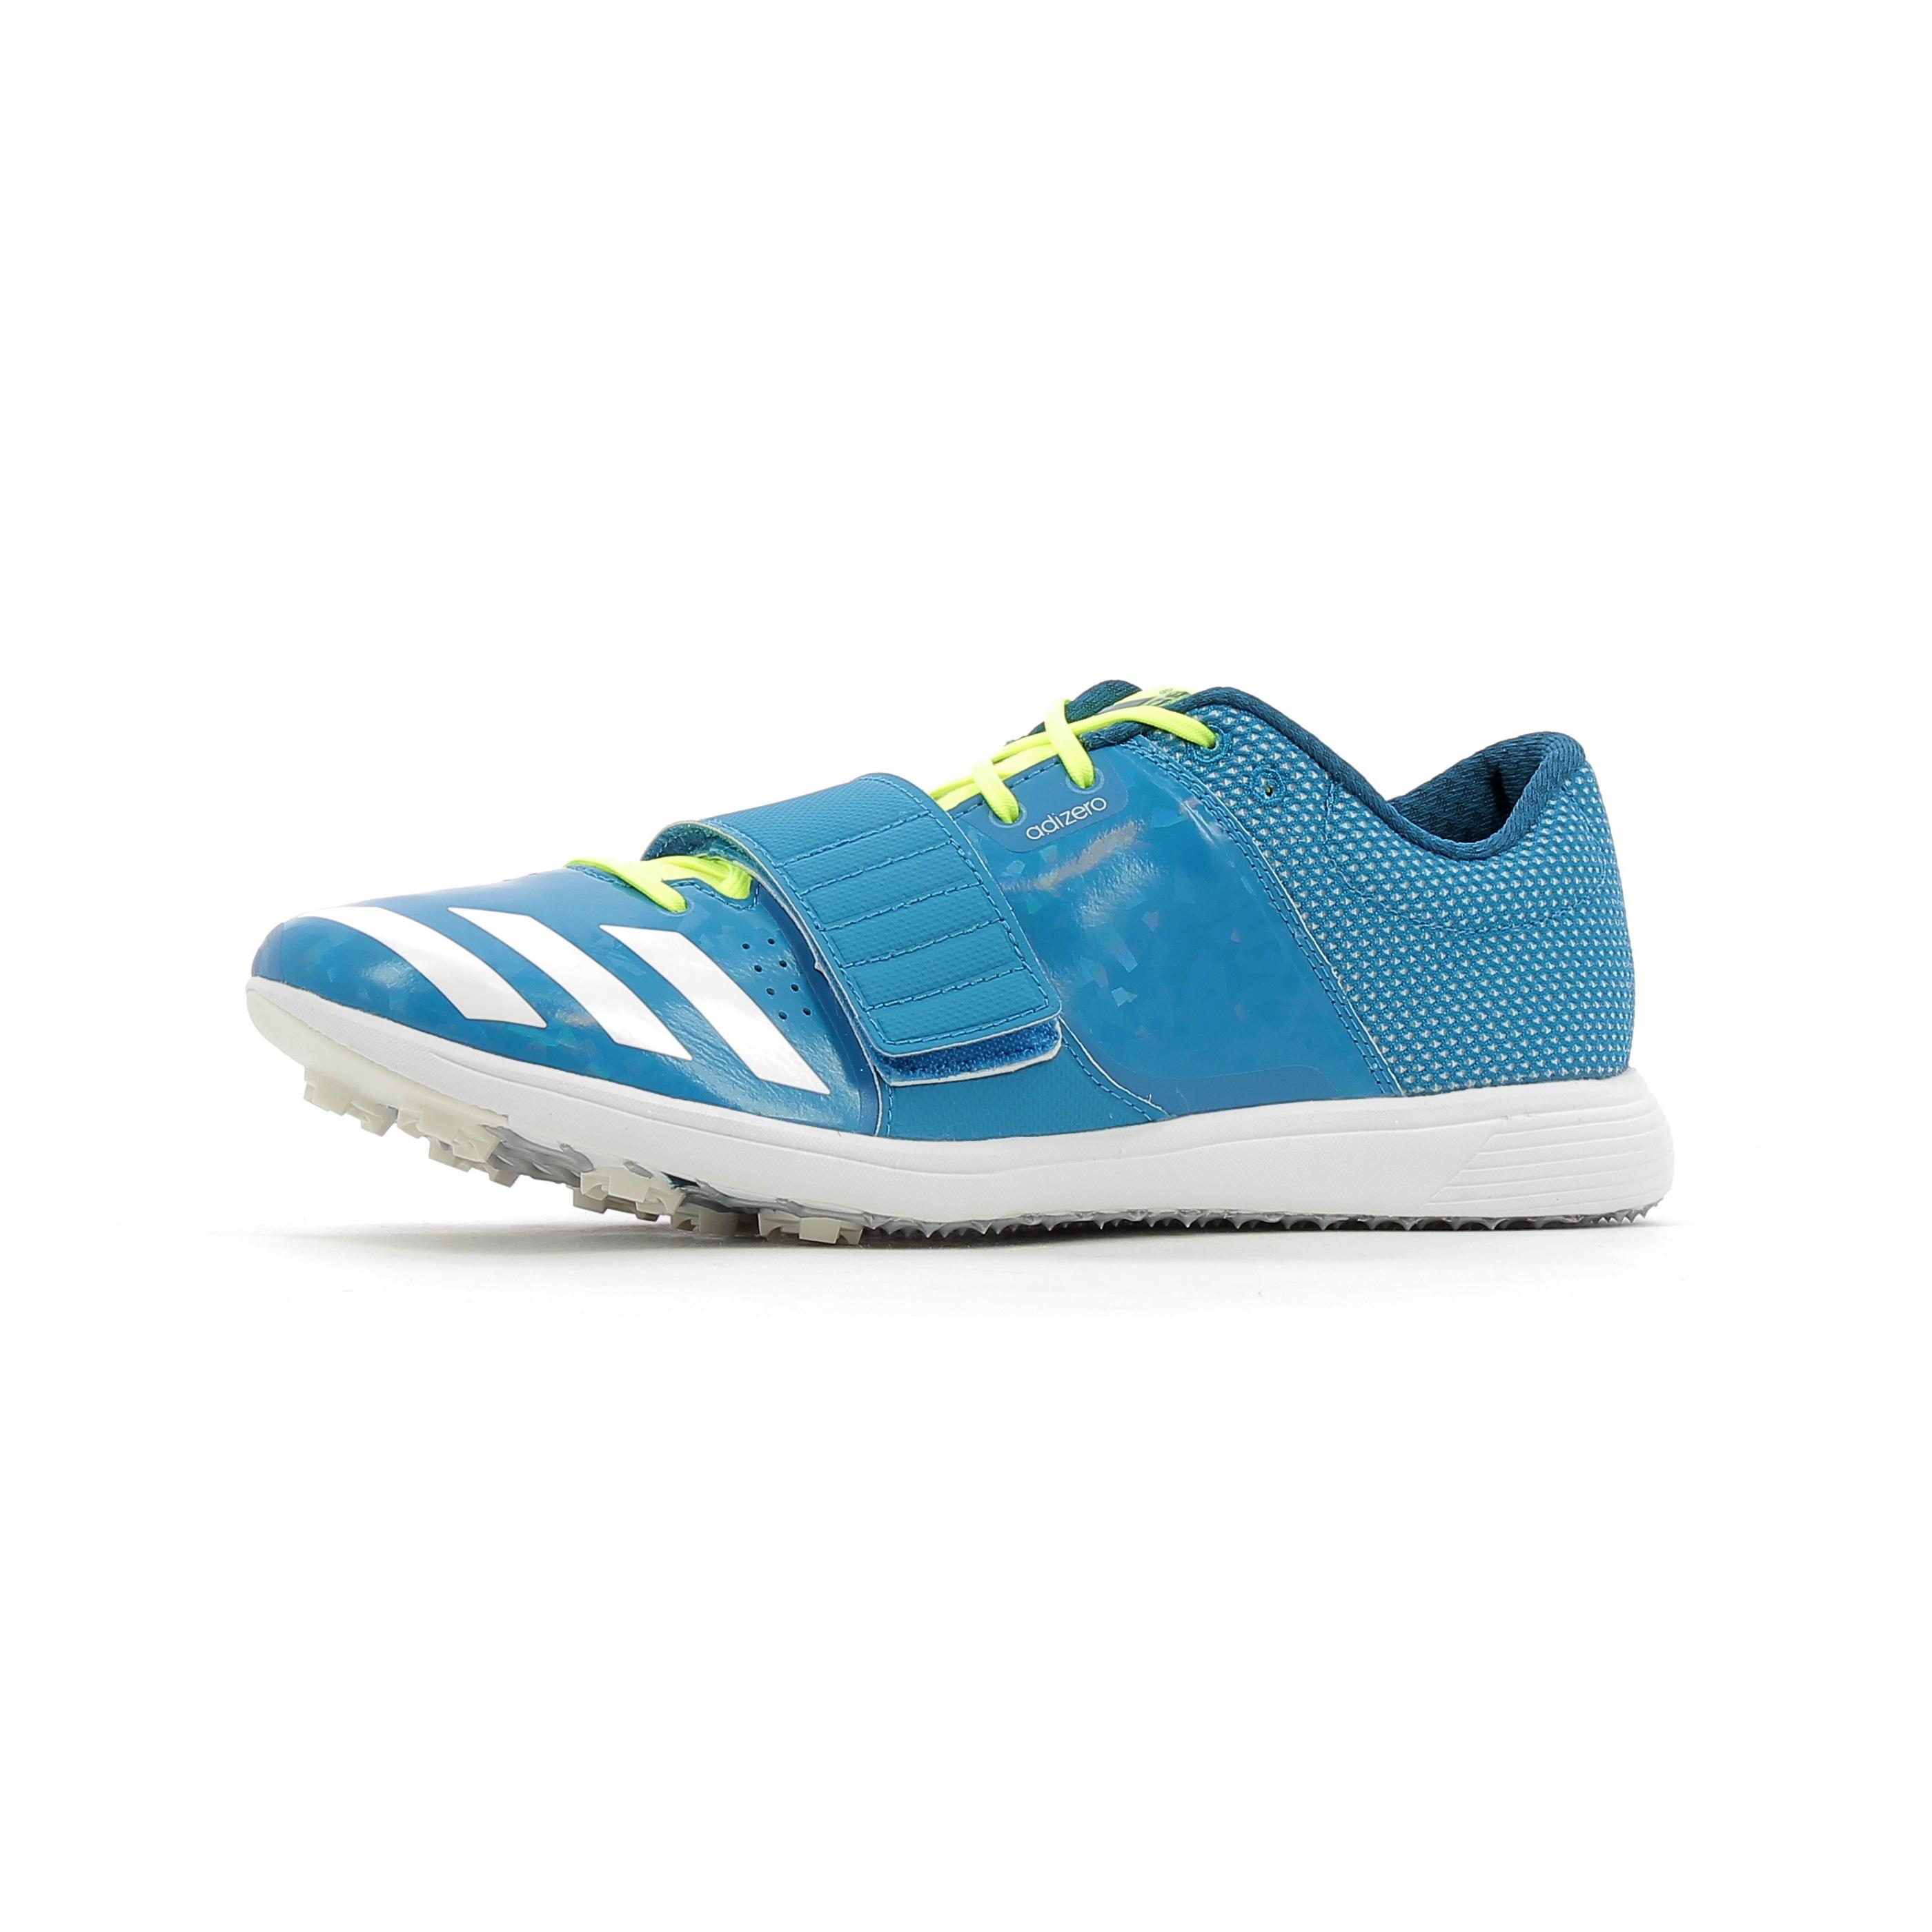 purchase cheap a526d f3194 Chaussures dAthlétisme adidas running Adizero TJPV Bleu